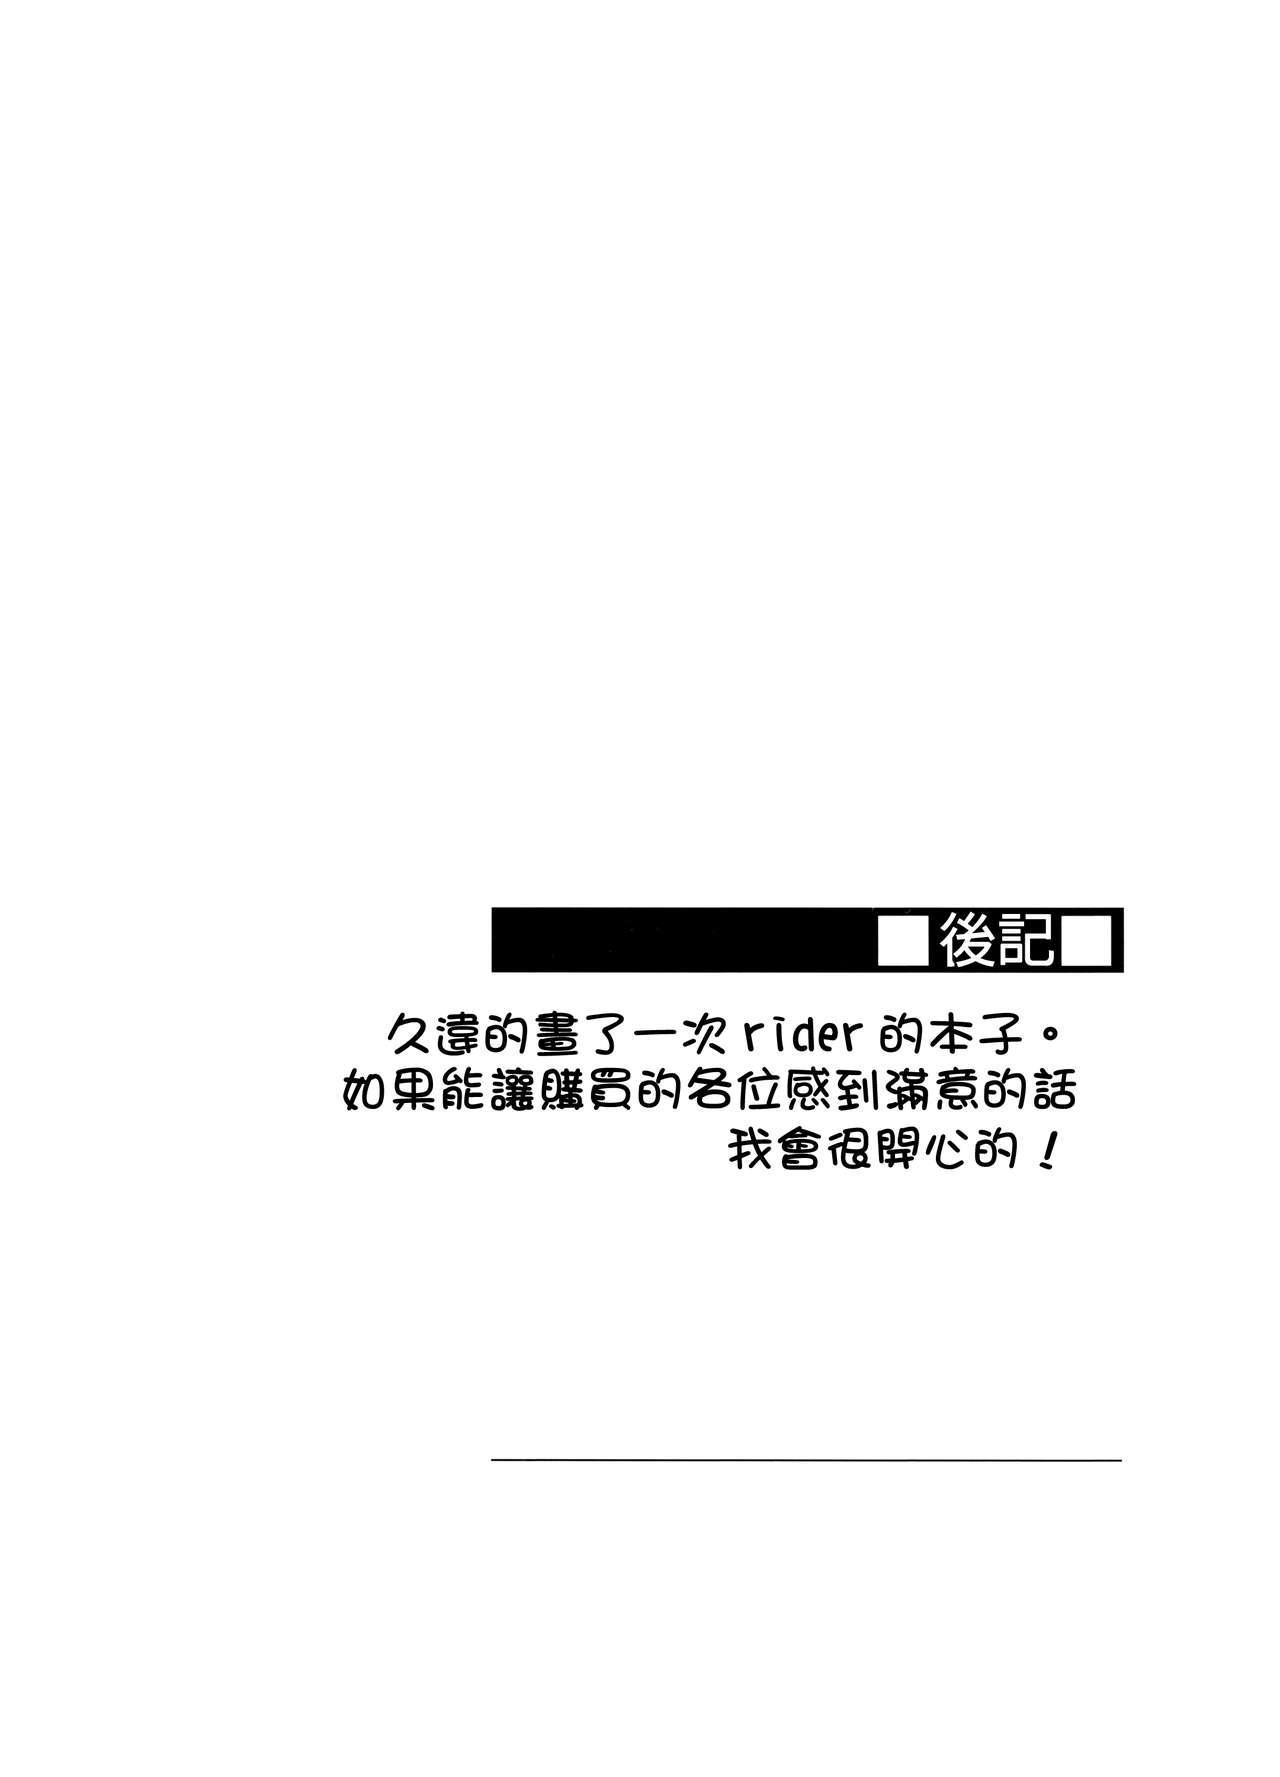 Rider-san to Oshiire. 23